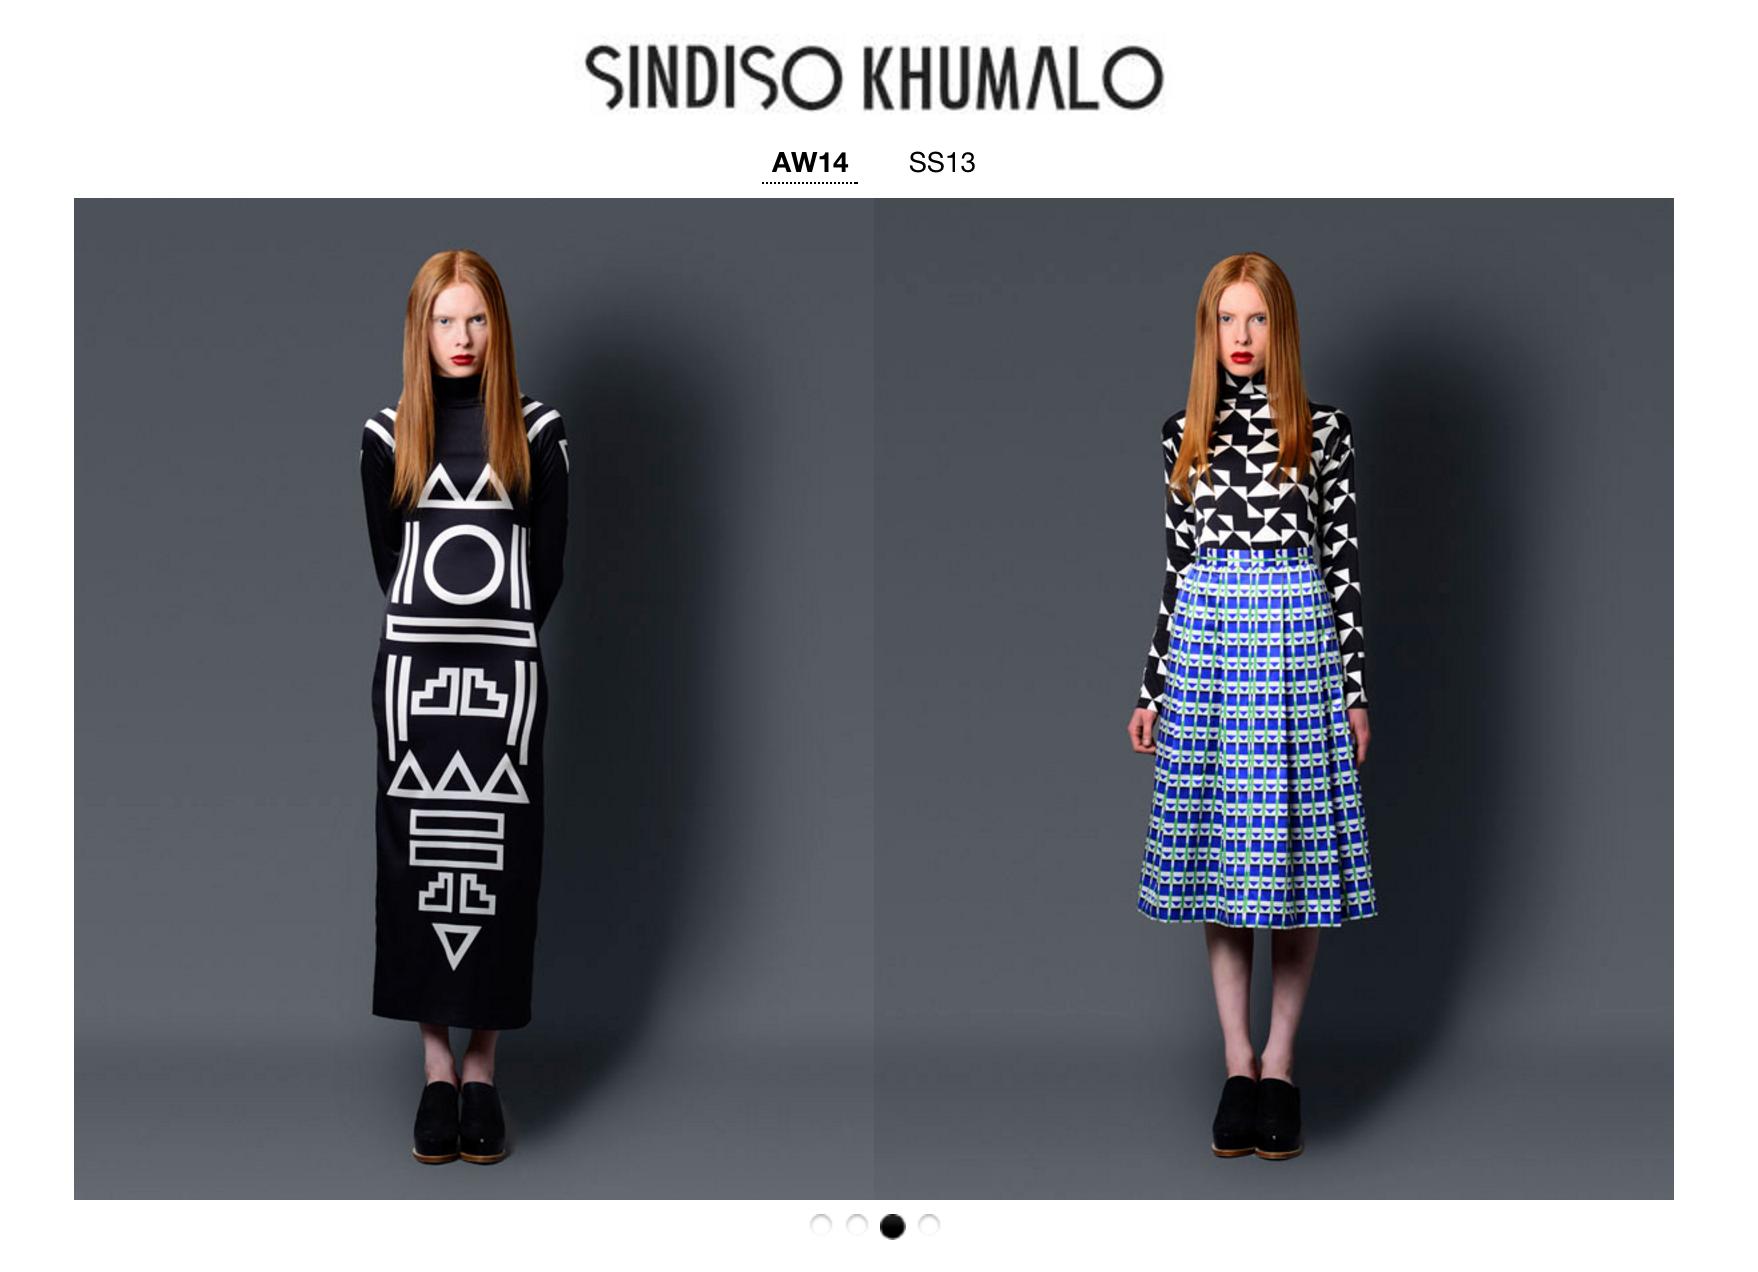 Sindiso Khumalo